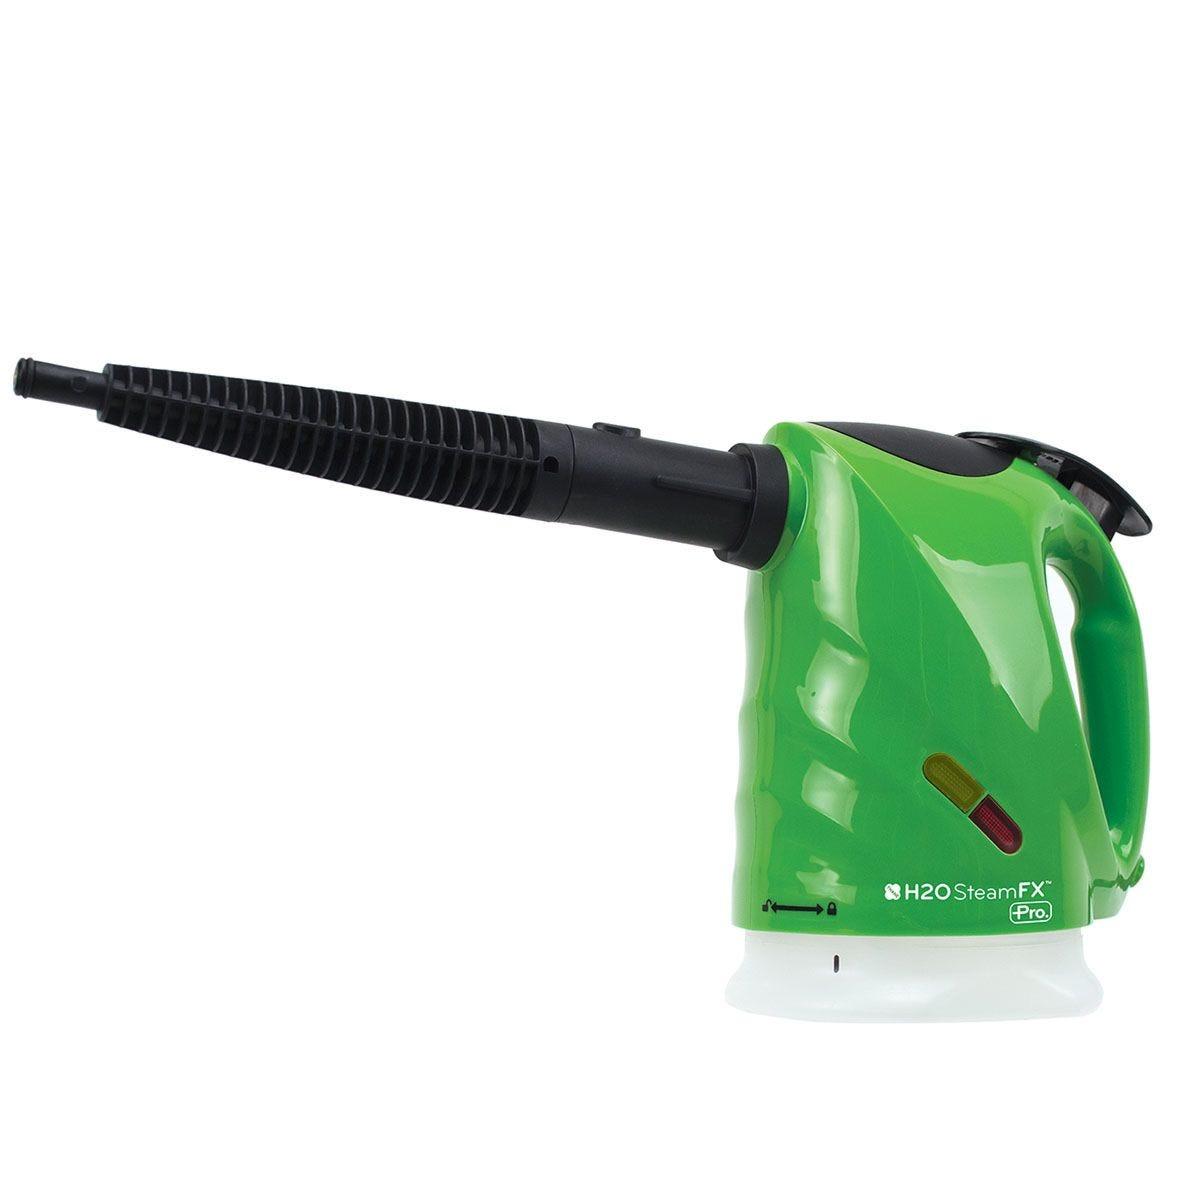 Thane H2O Steam FX Pro Steam Cleaner - Green